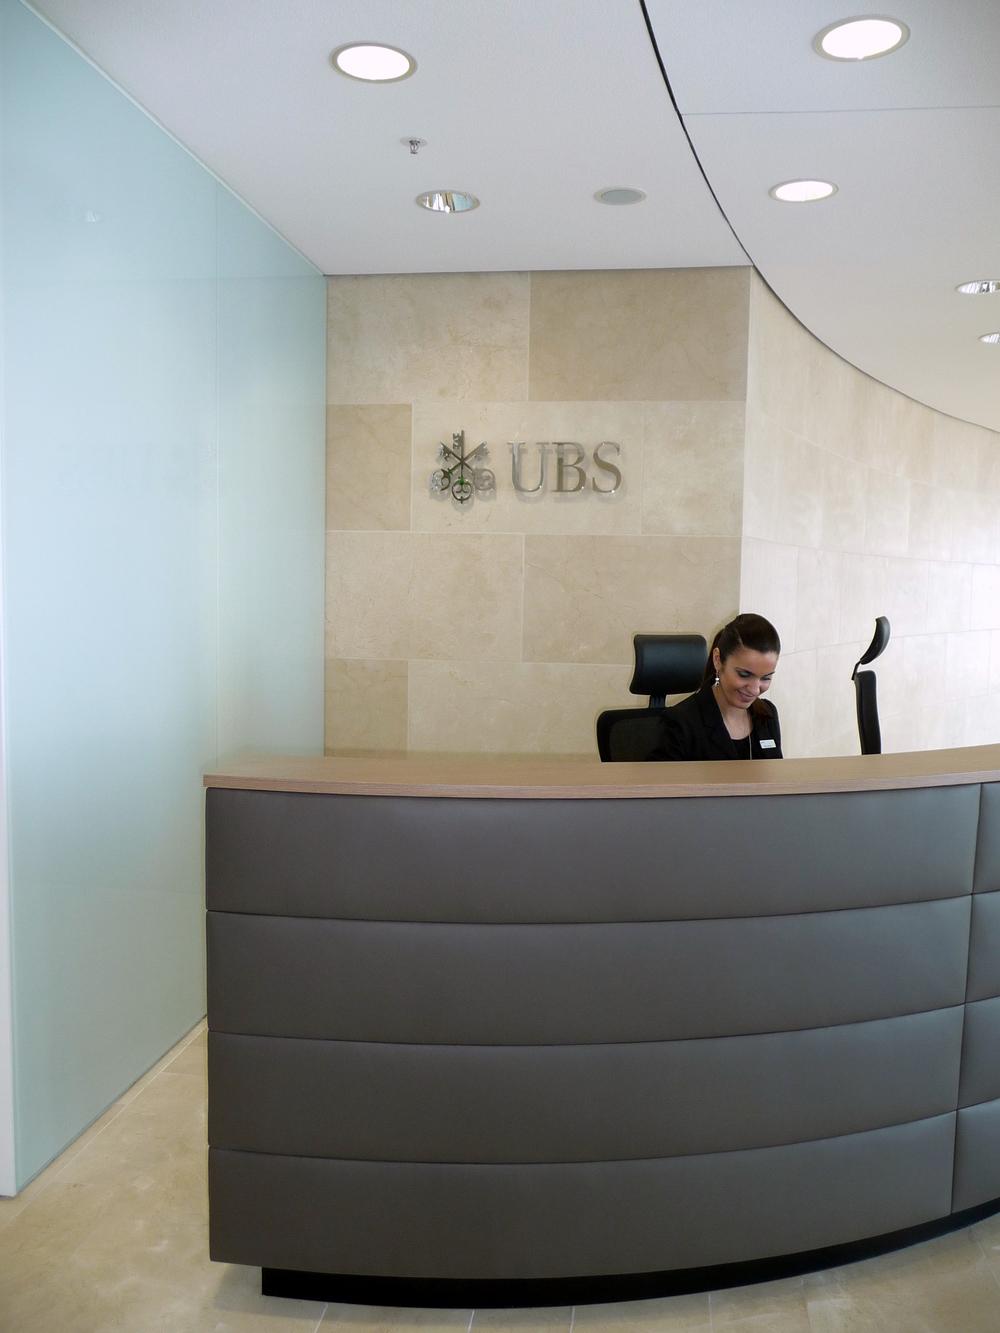 Emgfang UBS 39 St.JPG